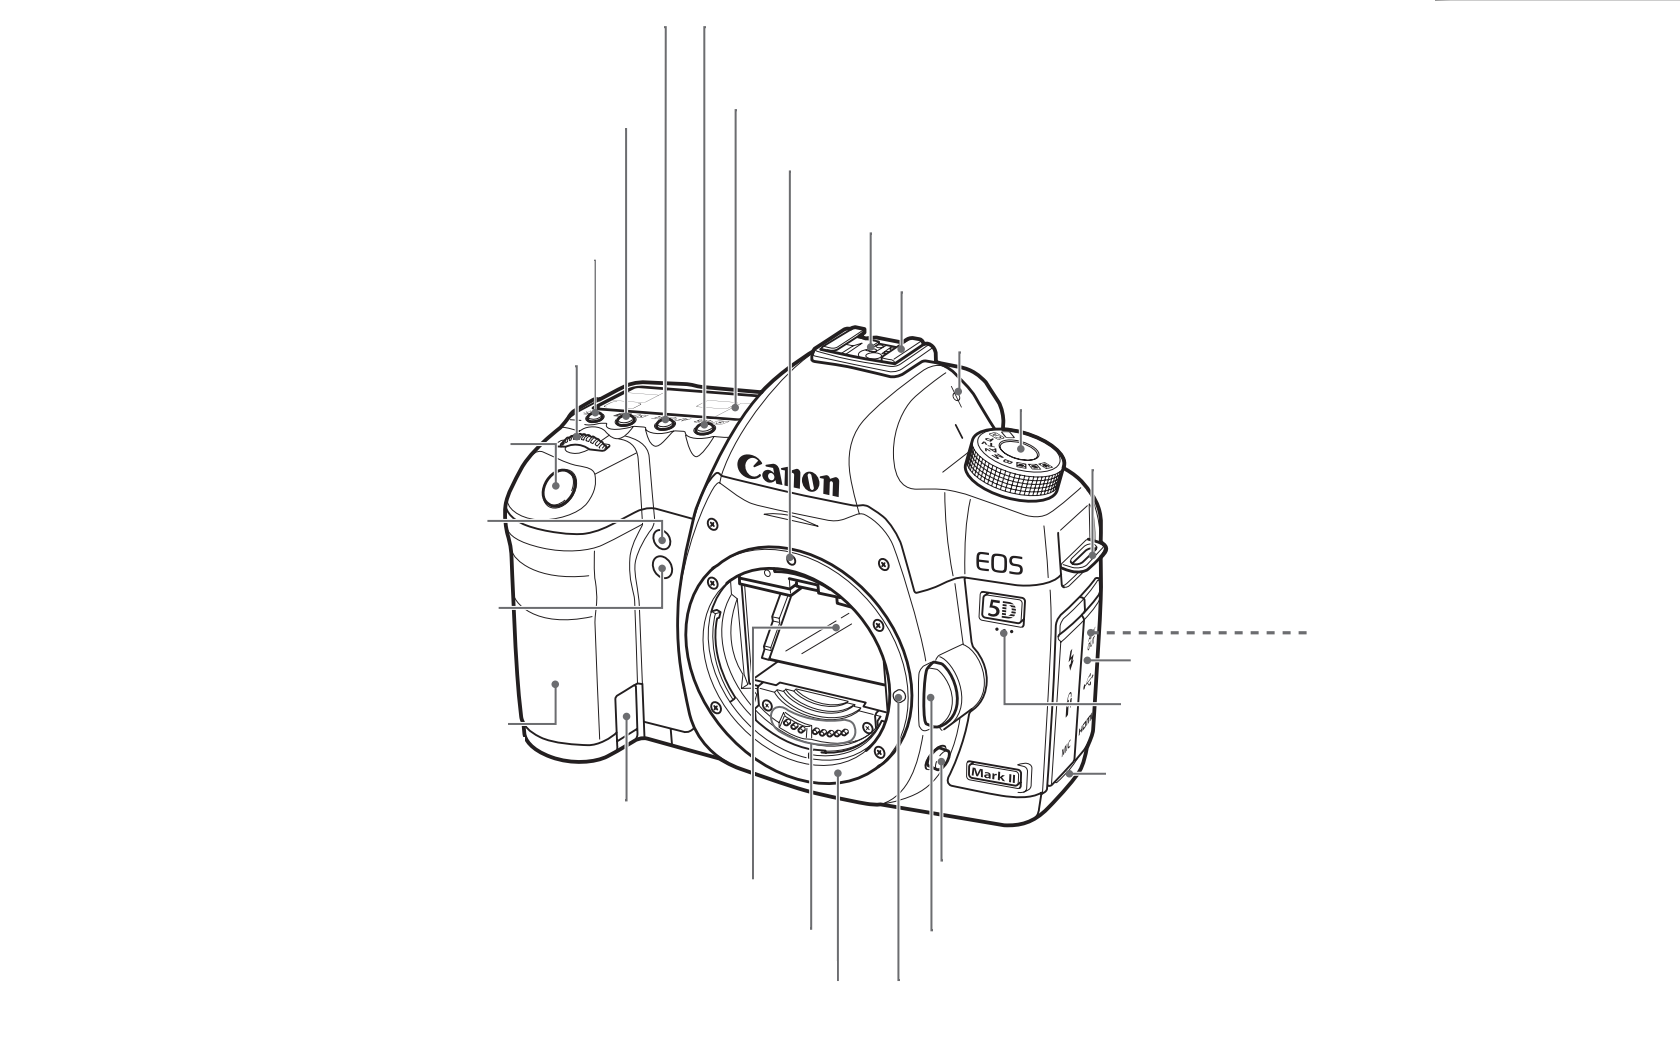 camerafrontWHITE